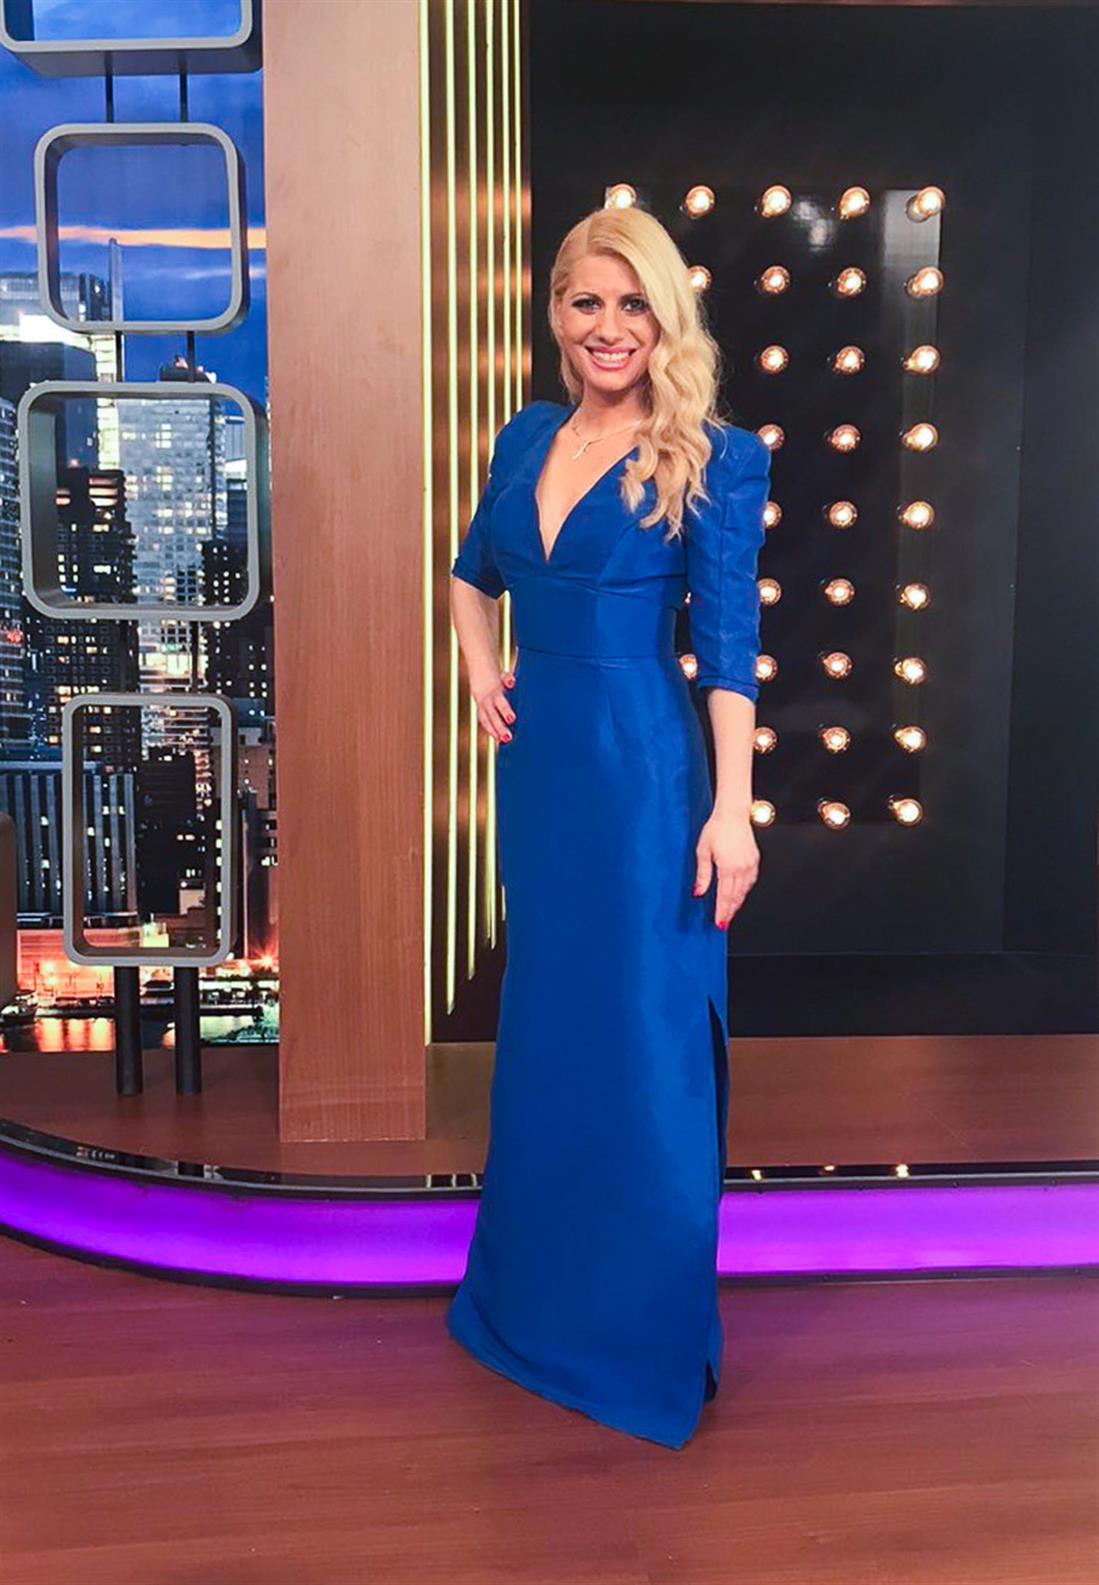 The 2Night Show - Άννα Μαρία Ψυχαράκη